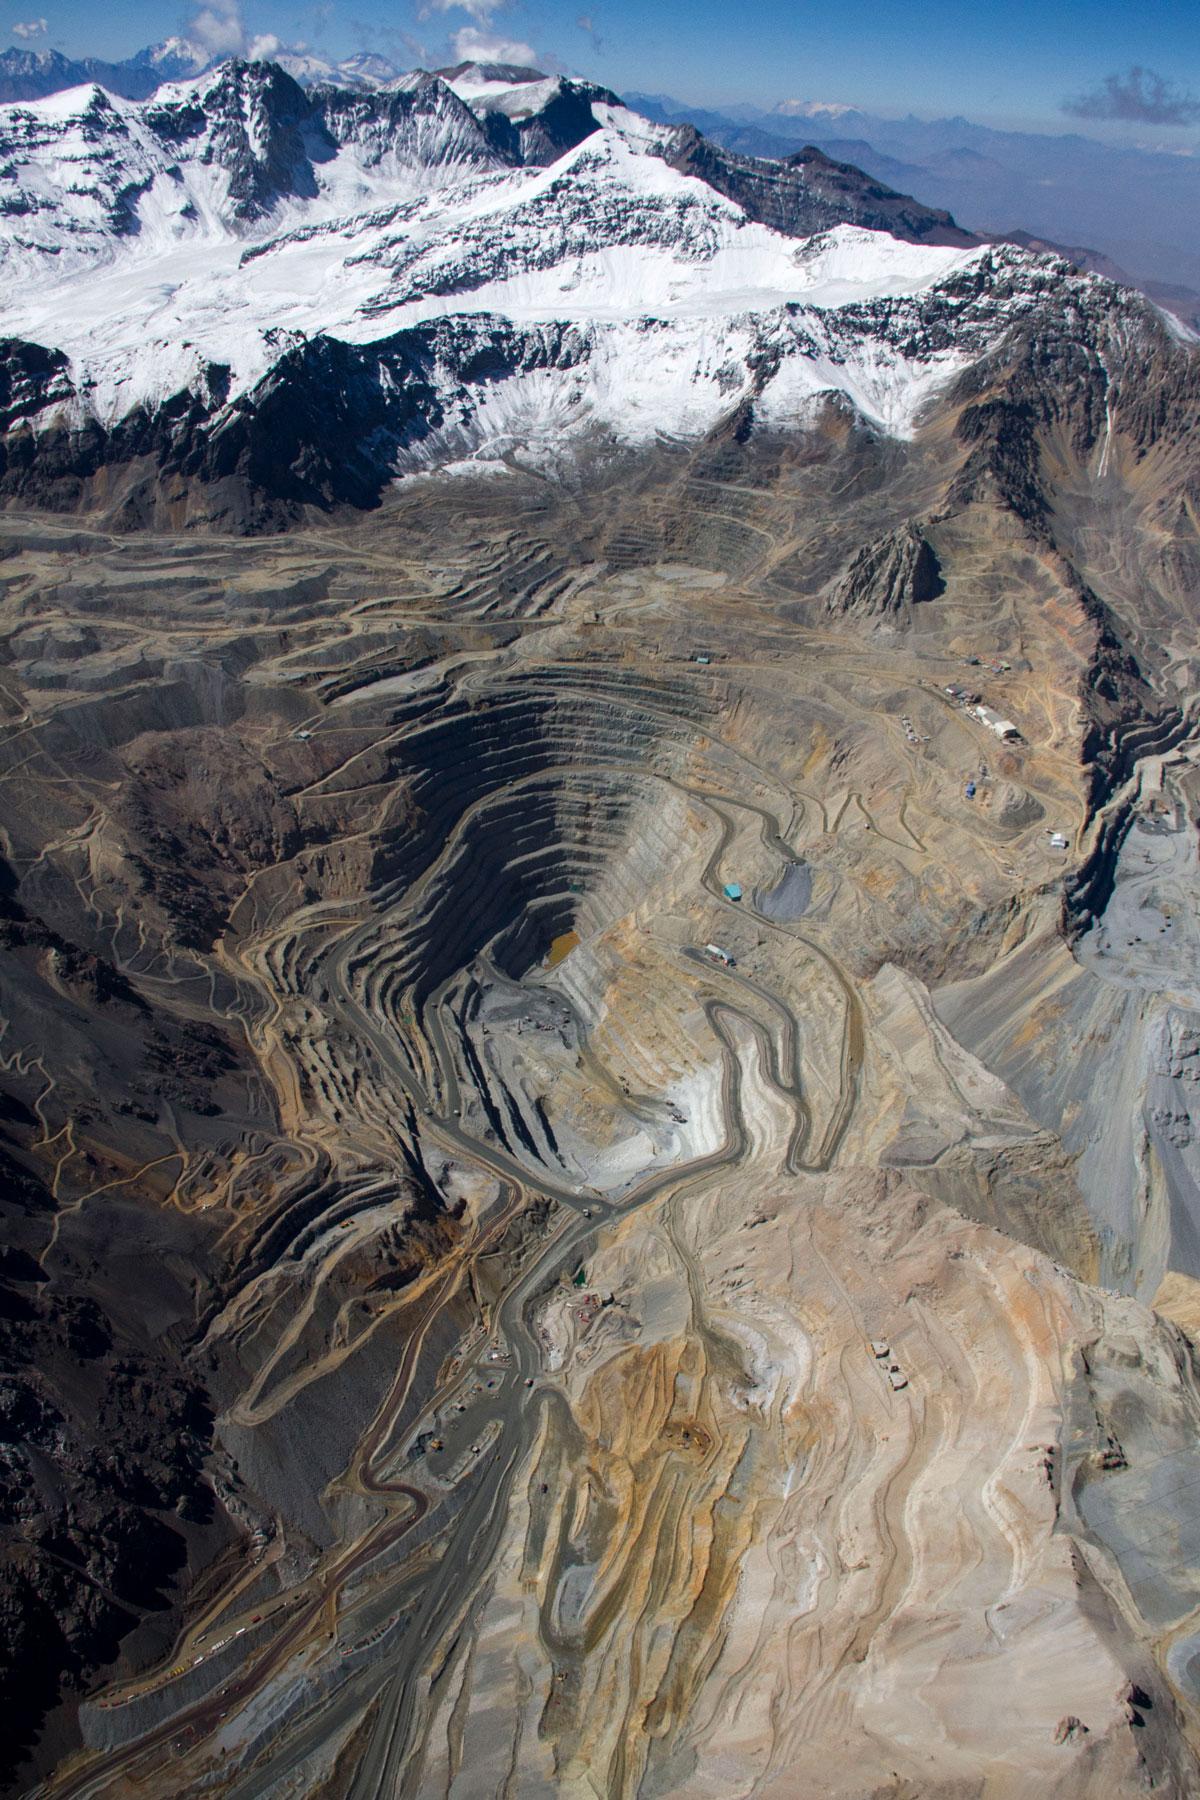 Kupferabbau, Kupfermine, Rohstoff Kupfer